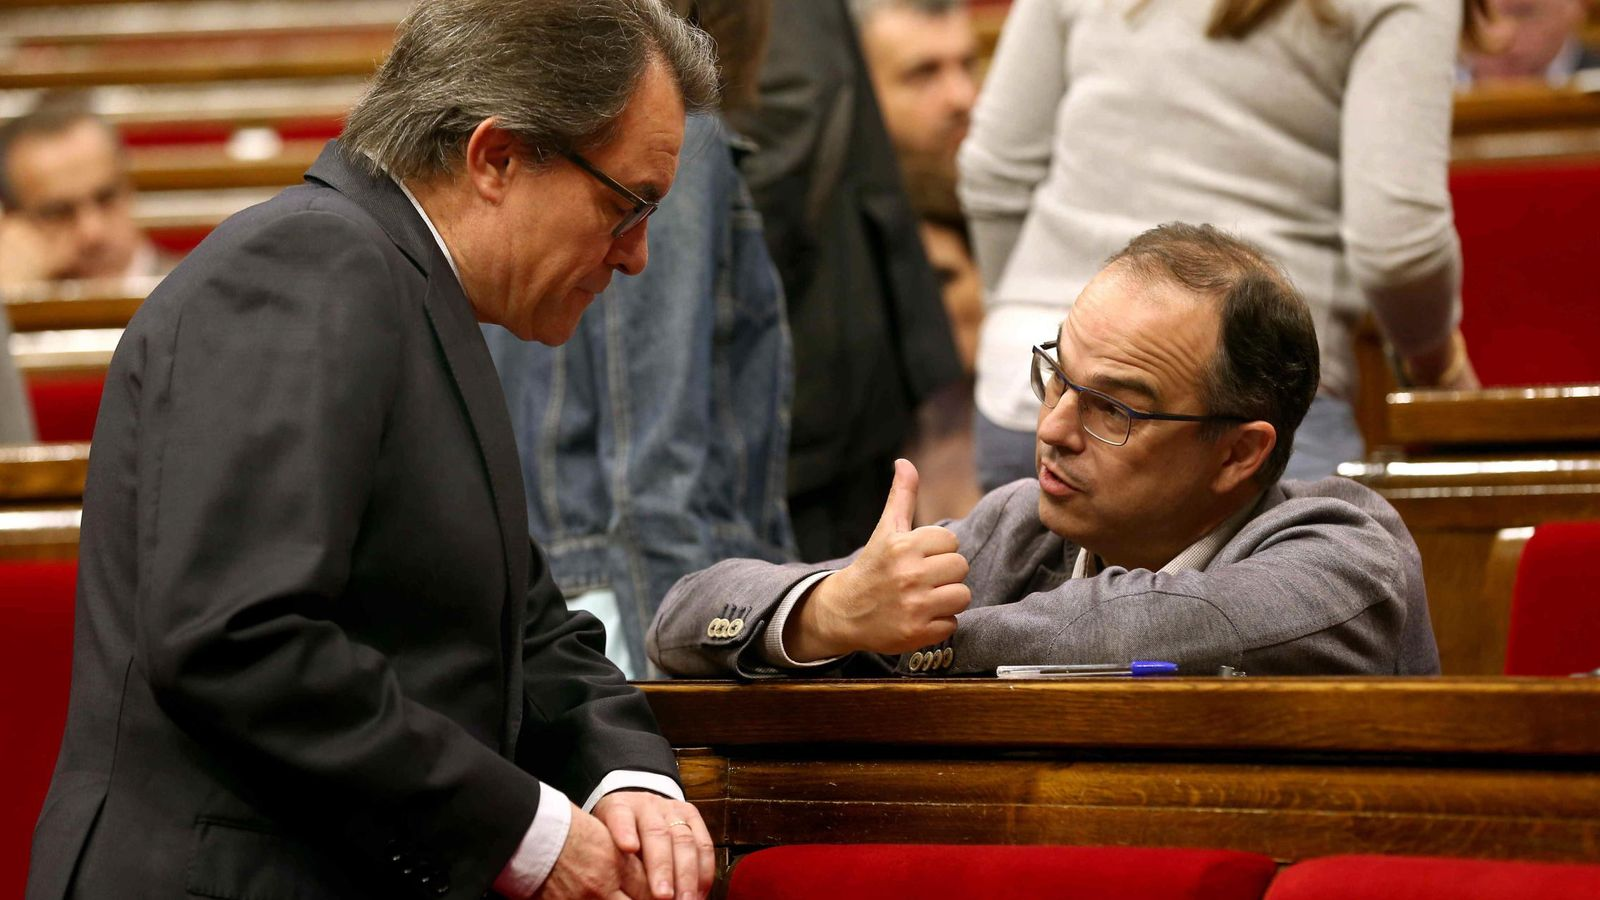 Foto: El presidente de la Generalitat, Artur Mas, habla con el portavoz de CiU en el Parlament, Jordi Turull. (Efe)